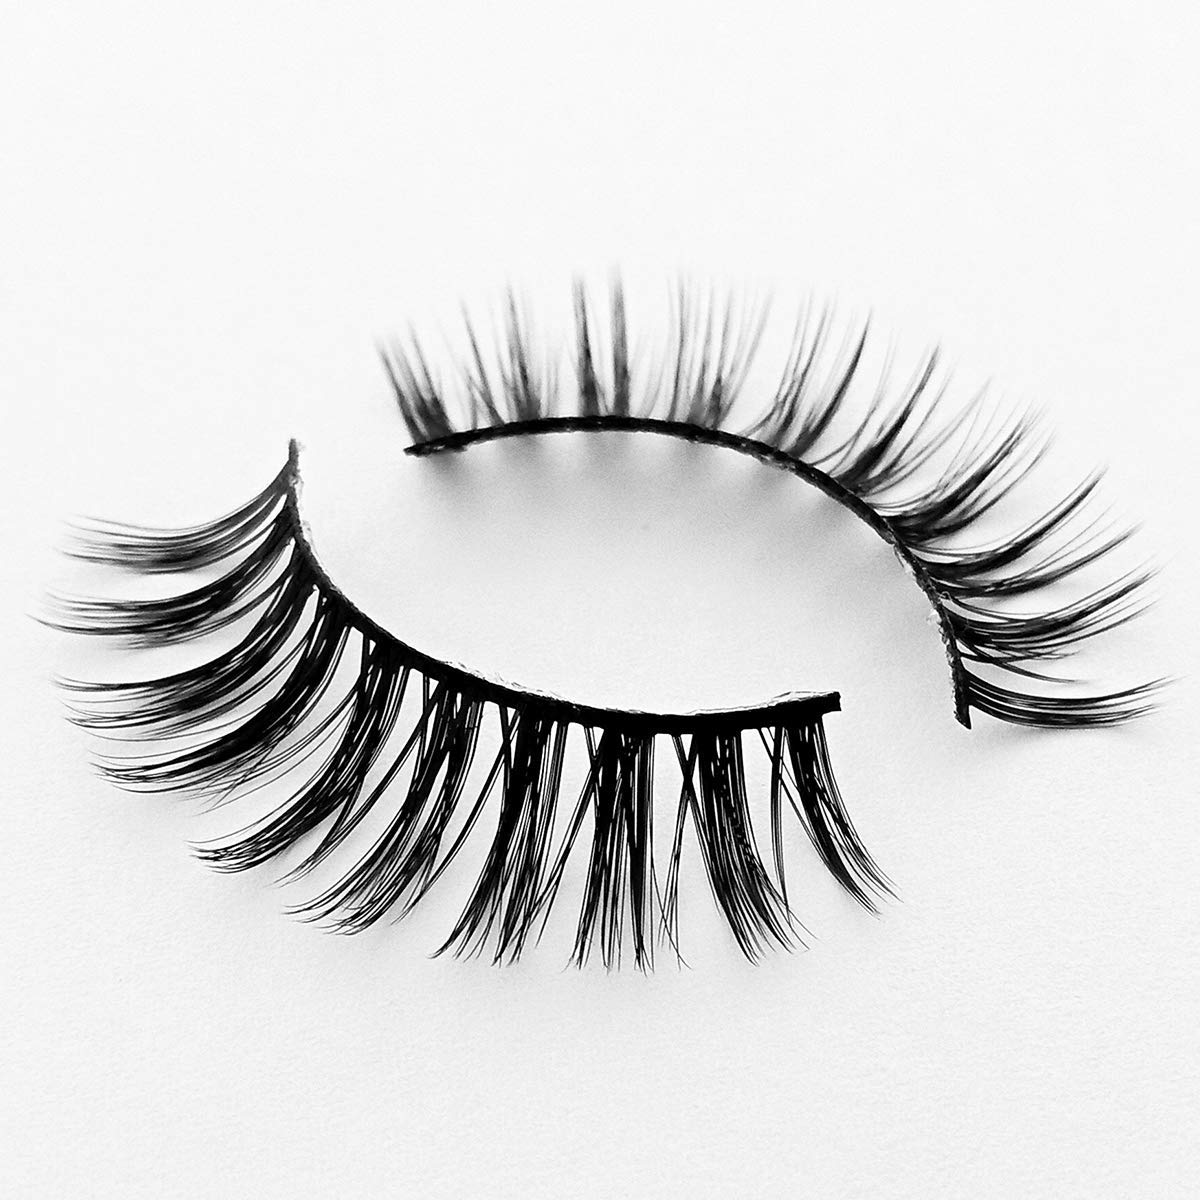 3D Wispies False Eyelashes Long Lashes With Volume for Women's Make Up Bulk Extensions Handmade Soft Fake Eye lash,5 Pairs